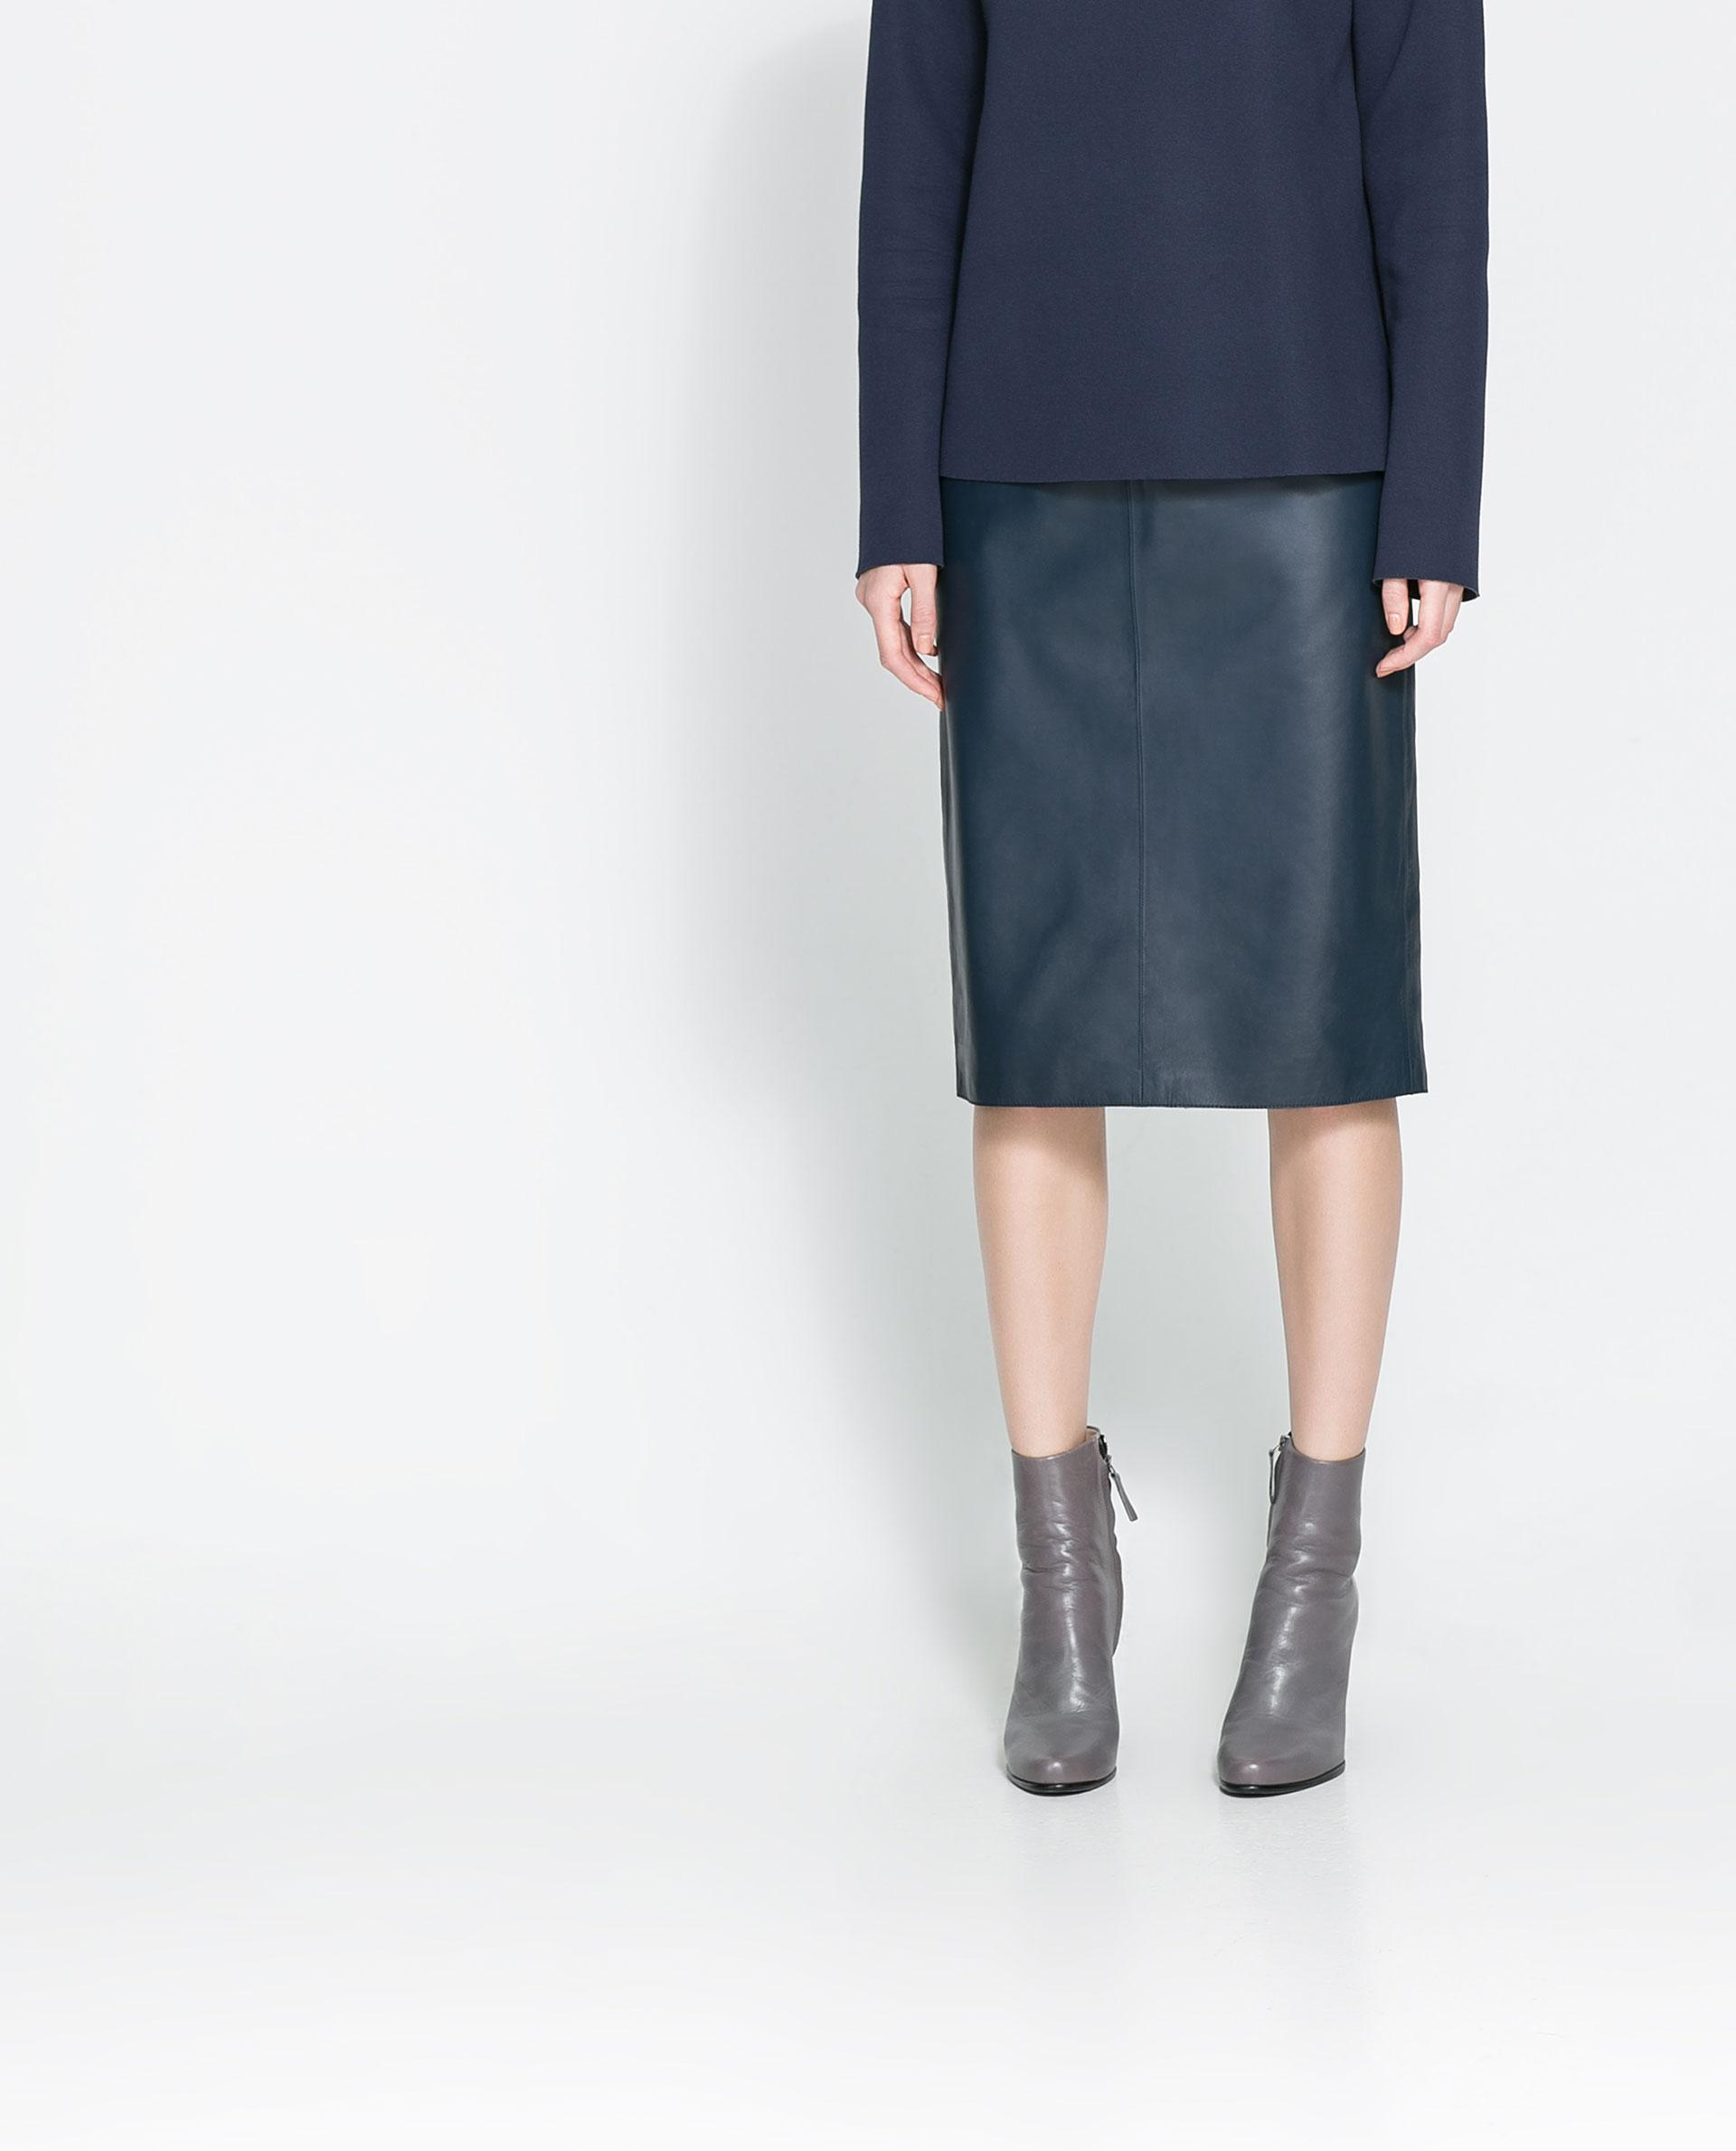 Zara Straight Leather Midi Skirt in Blue | Lyst